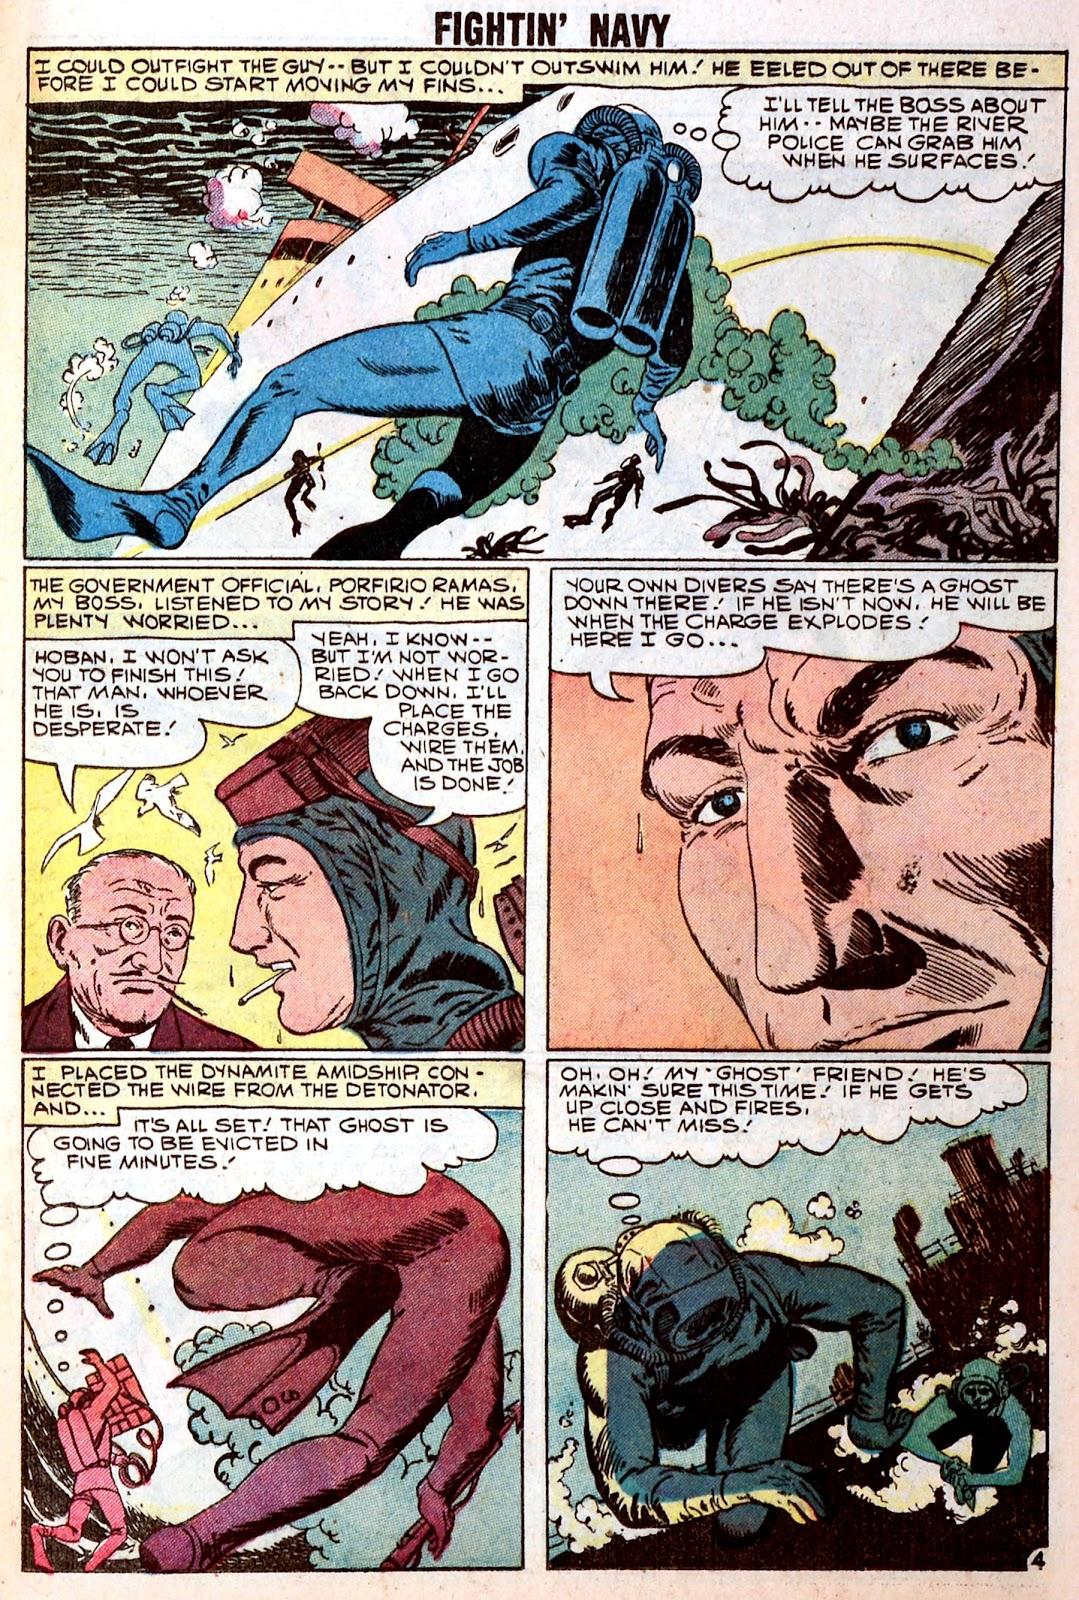 Read online Fightin' Navy comic -  Issue #85 - 25